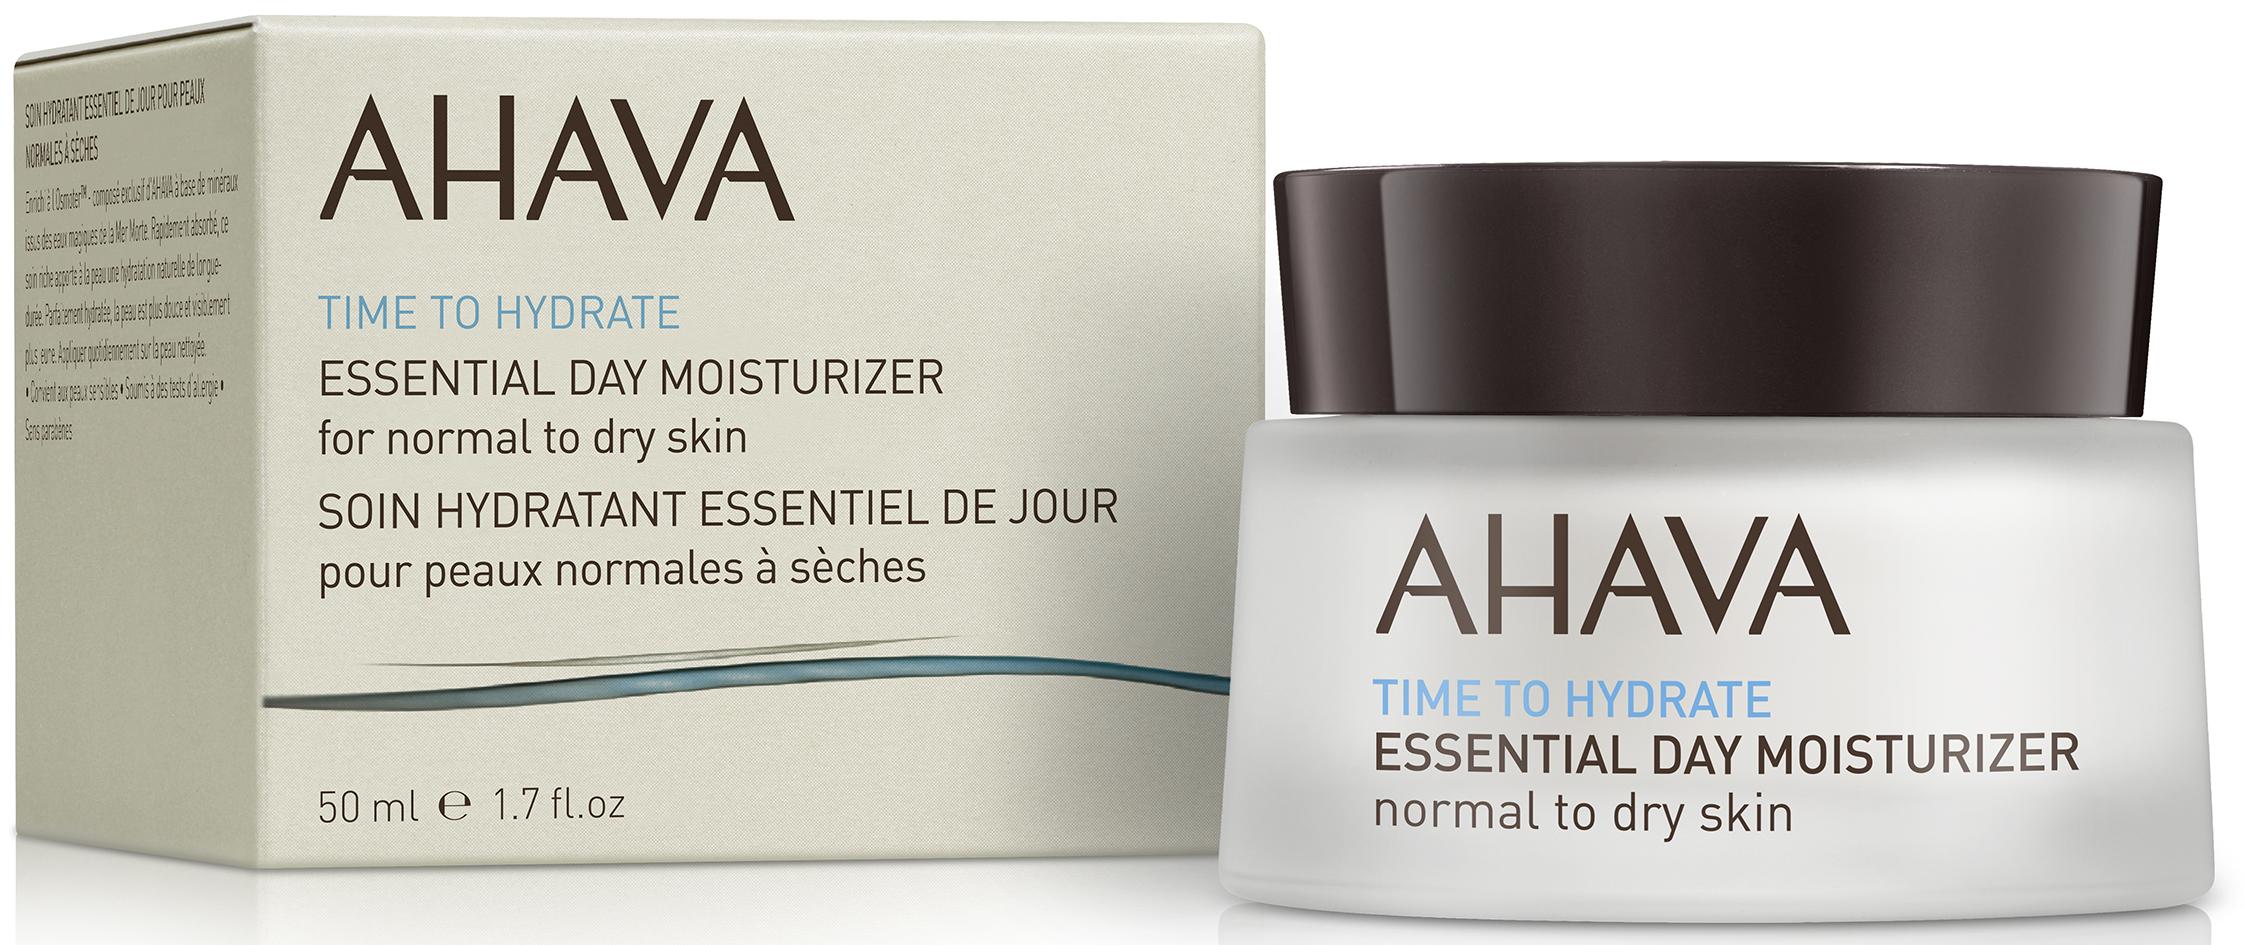 ahava essential day moisturizer normal to dry skin. Black Bedroom Furniture Sets. Home Design Ideas